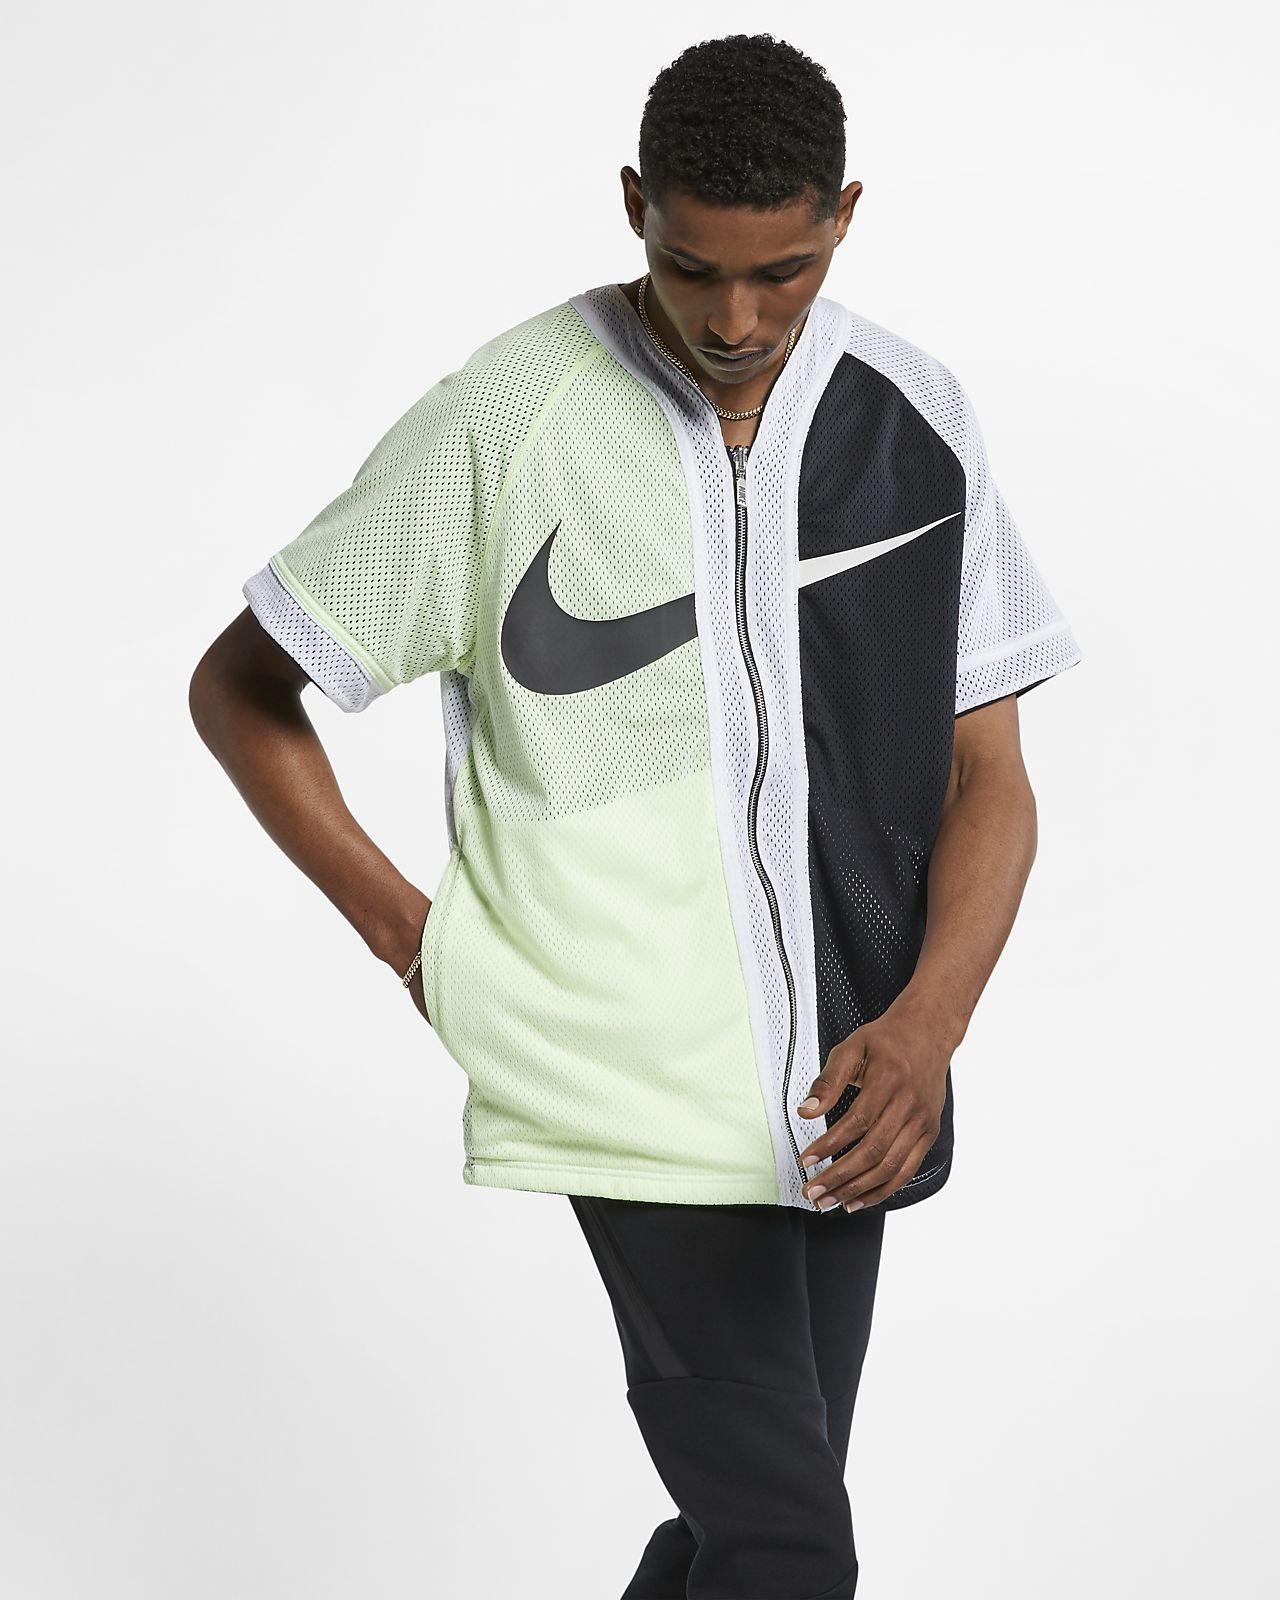 Haut de baseball NikeLab Collection pour Homme